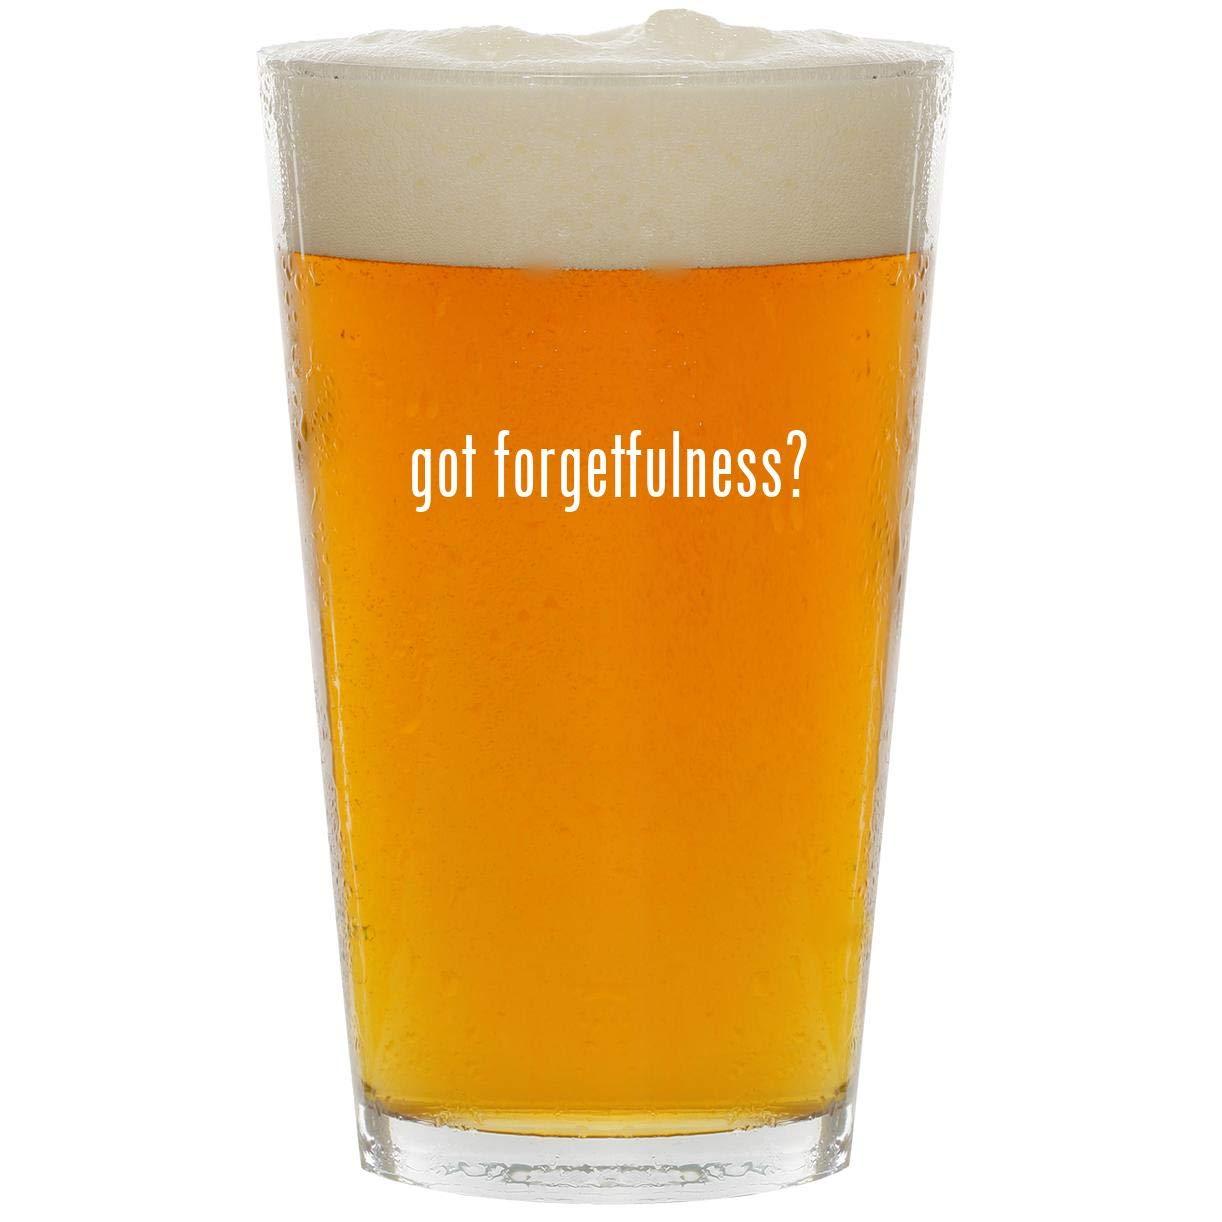 got forgetfulness? - Glass 16oz Beer Pint